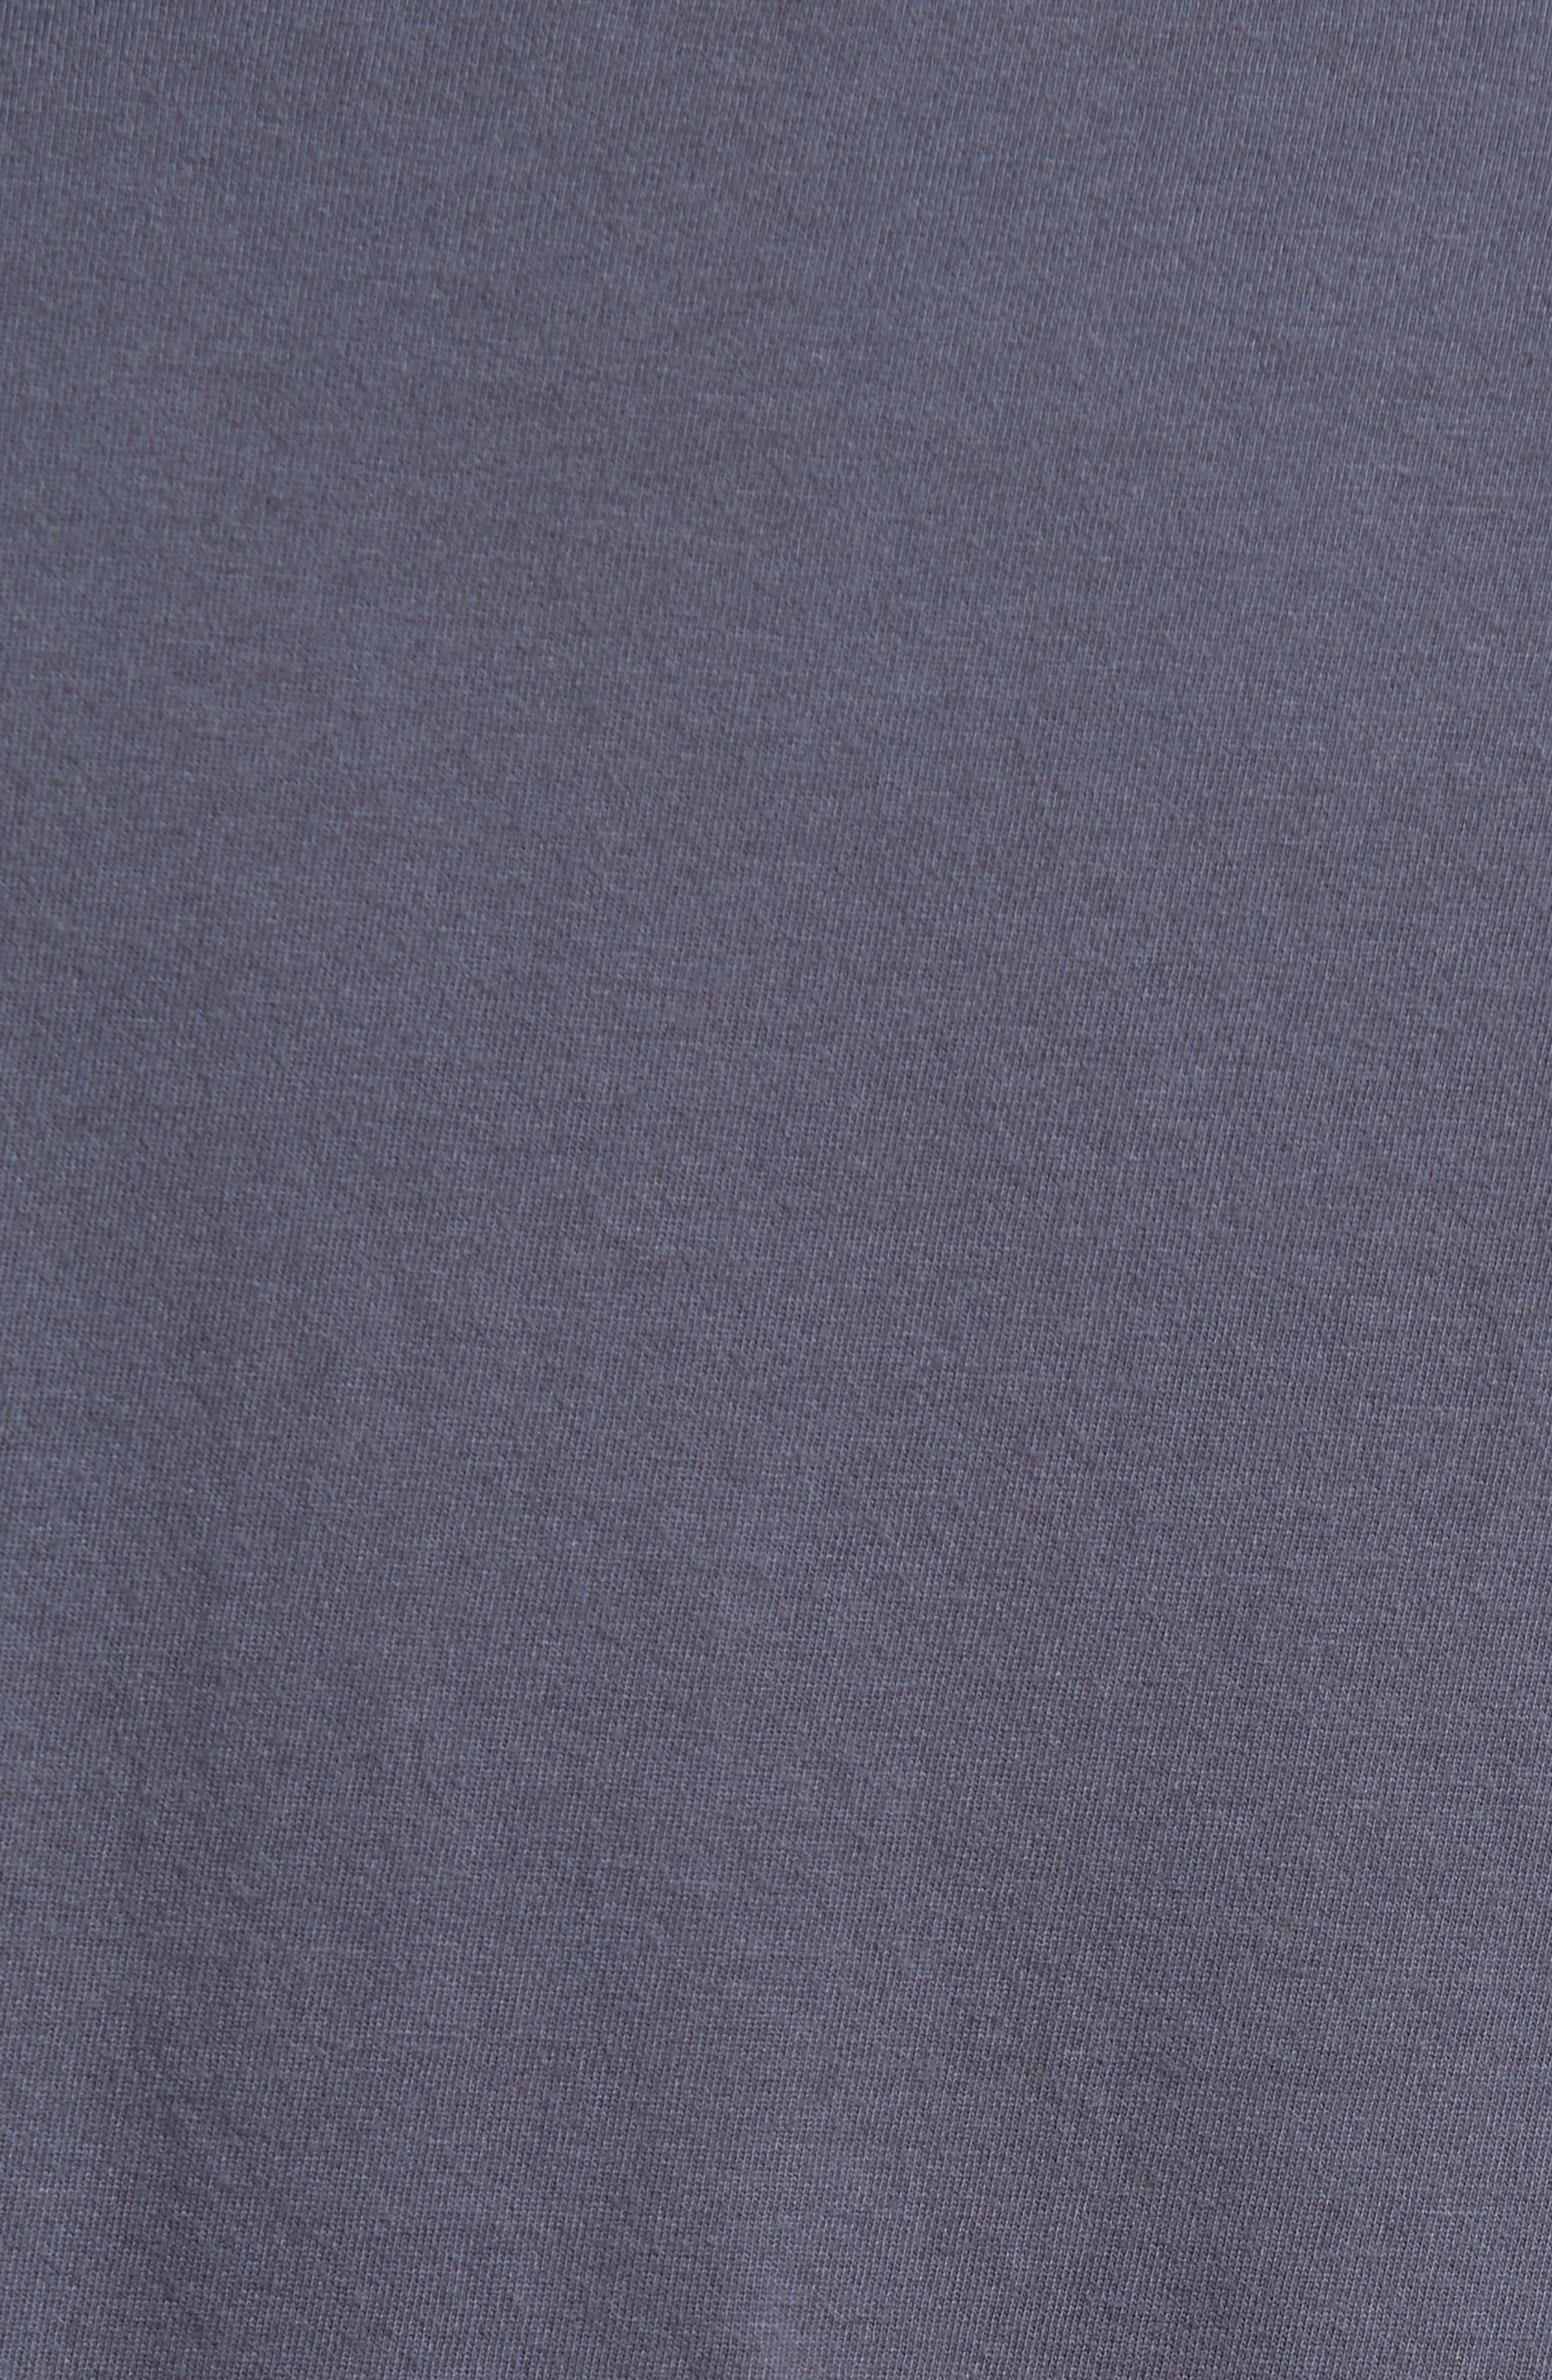 Eastwood Washington Nationals T-Shirt,                             Alternate thumbnail 5, color,                             410